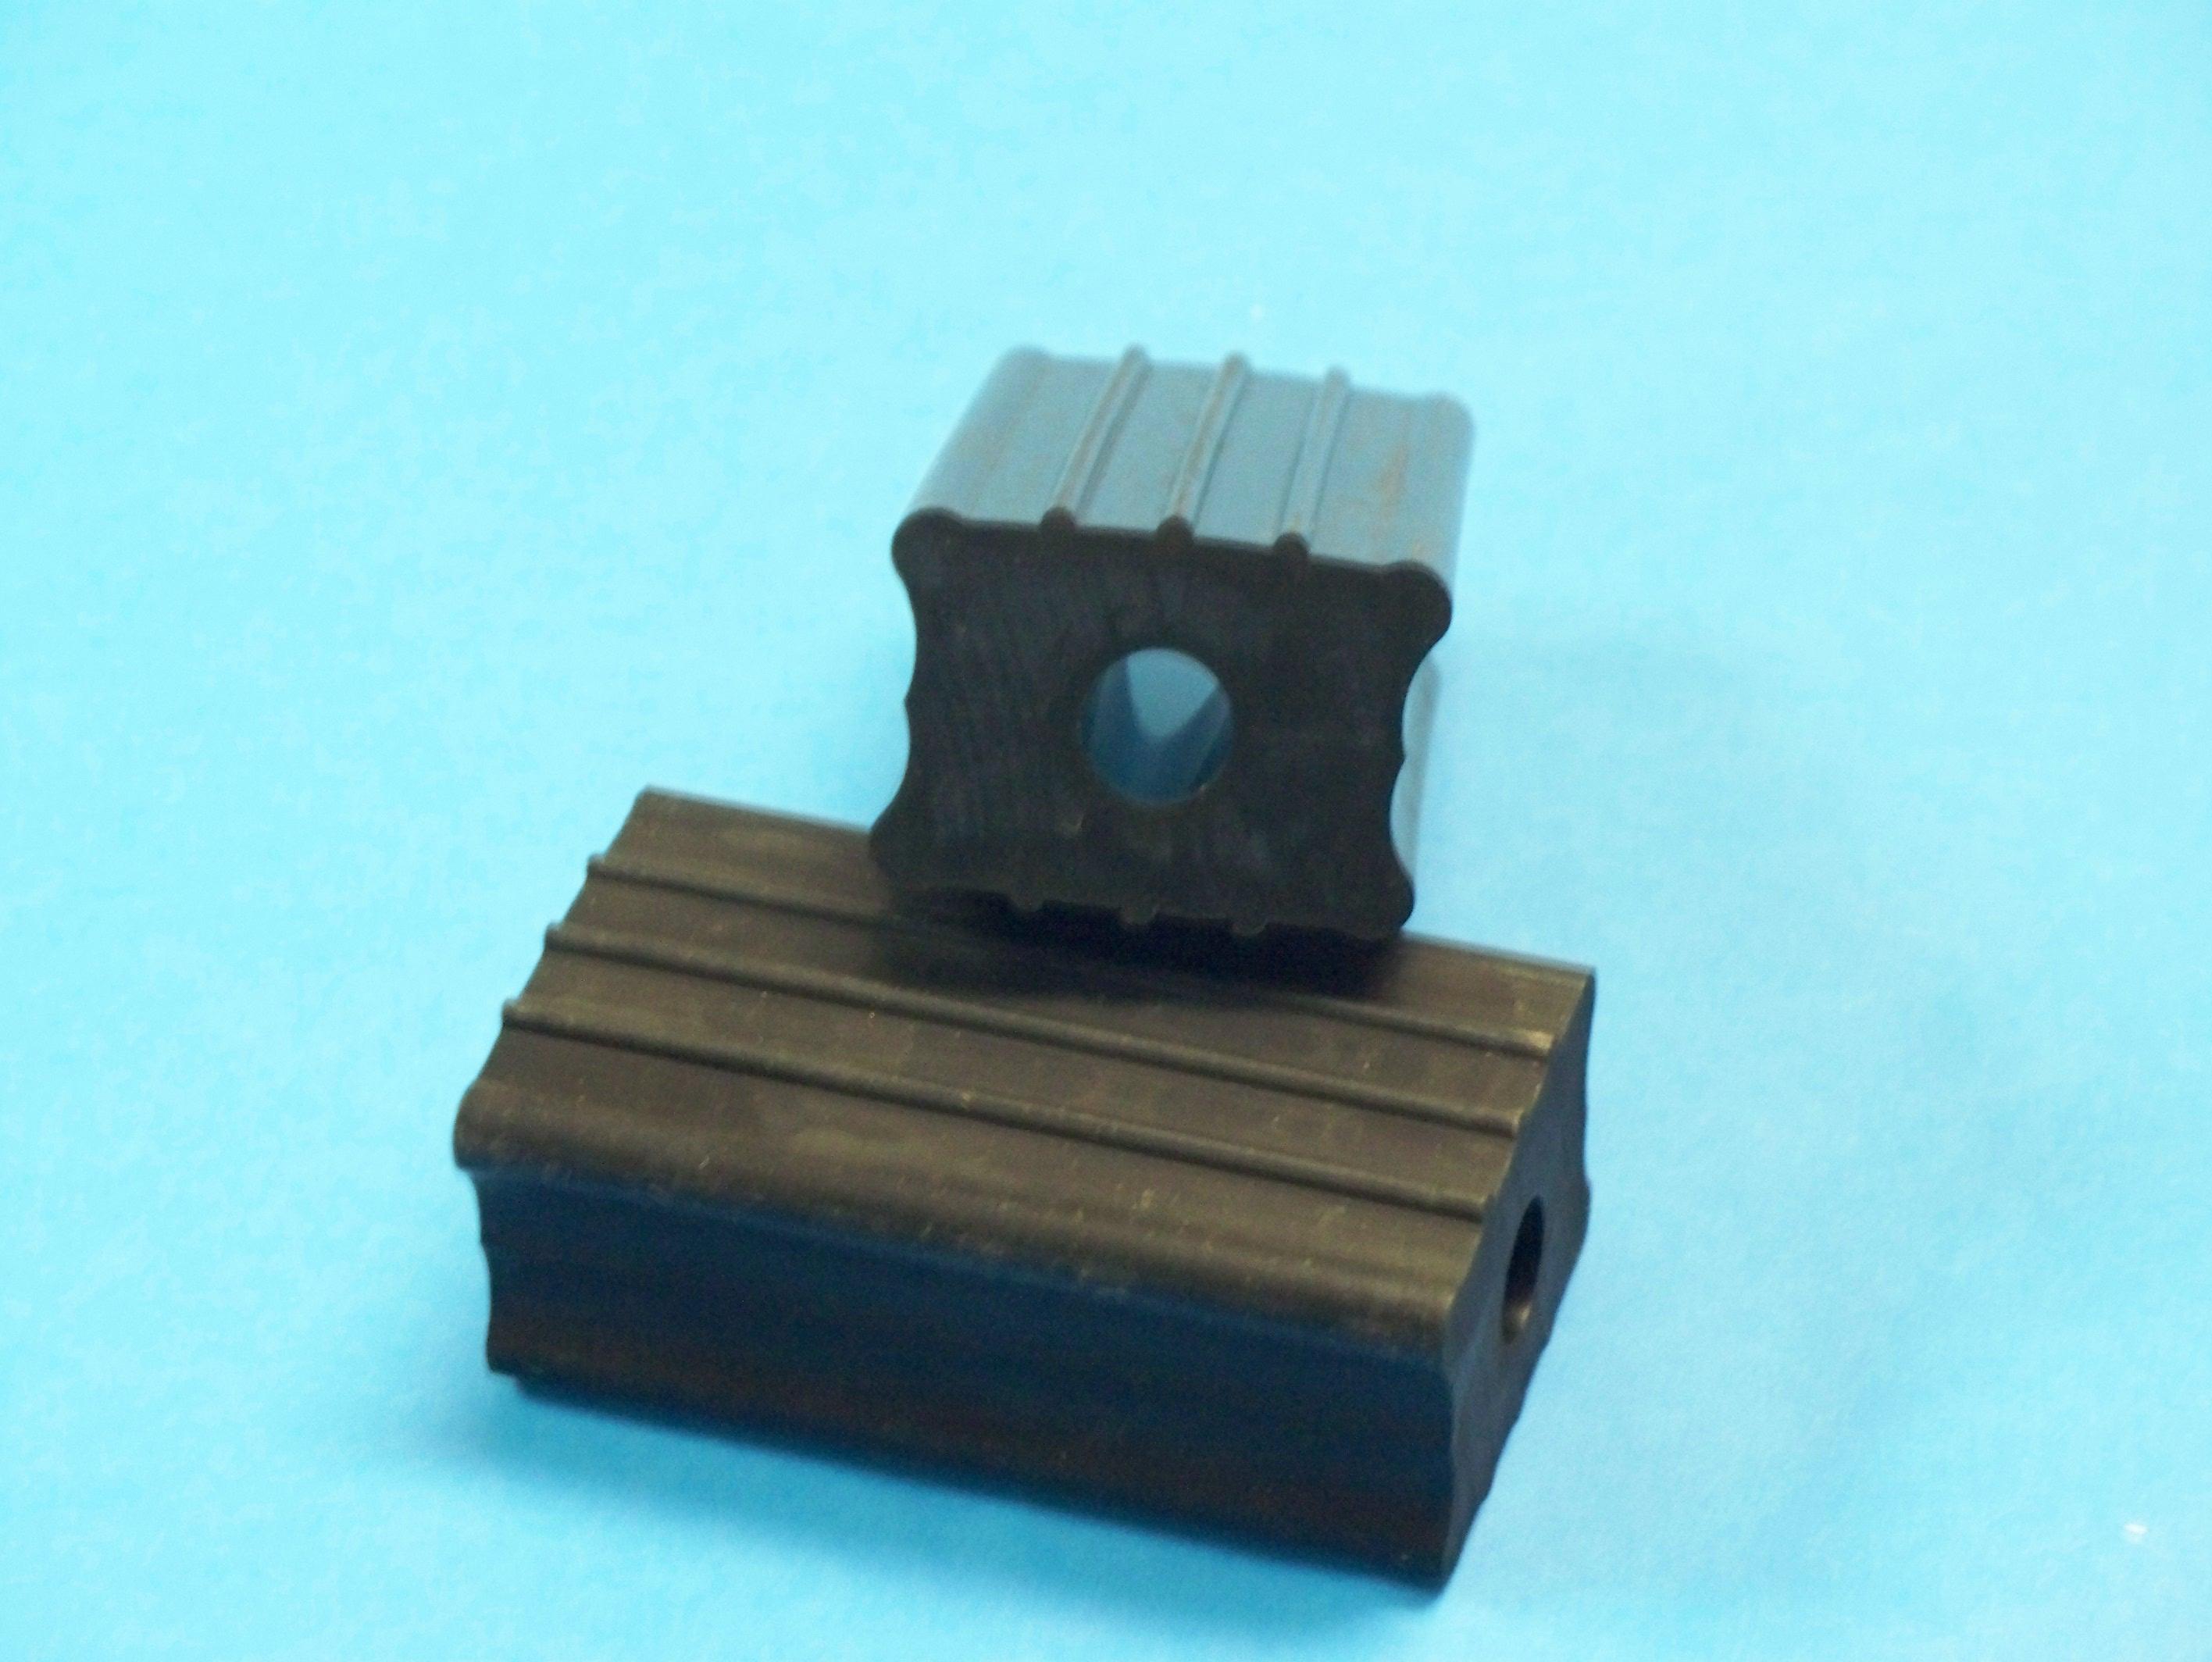 pedals-rubber.jpg